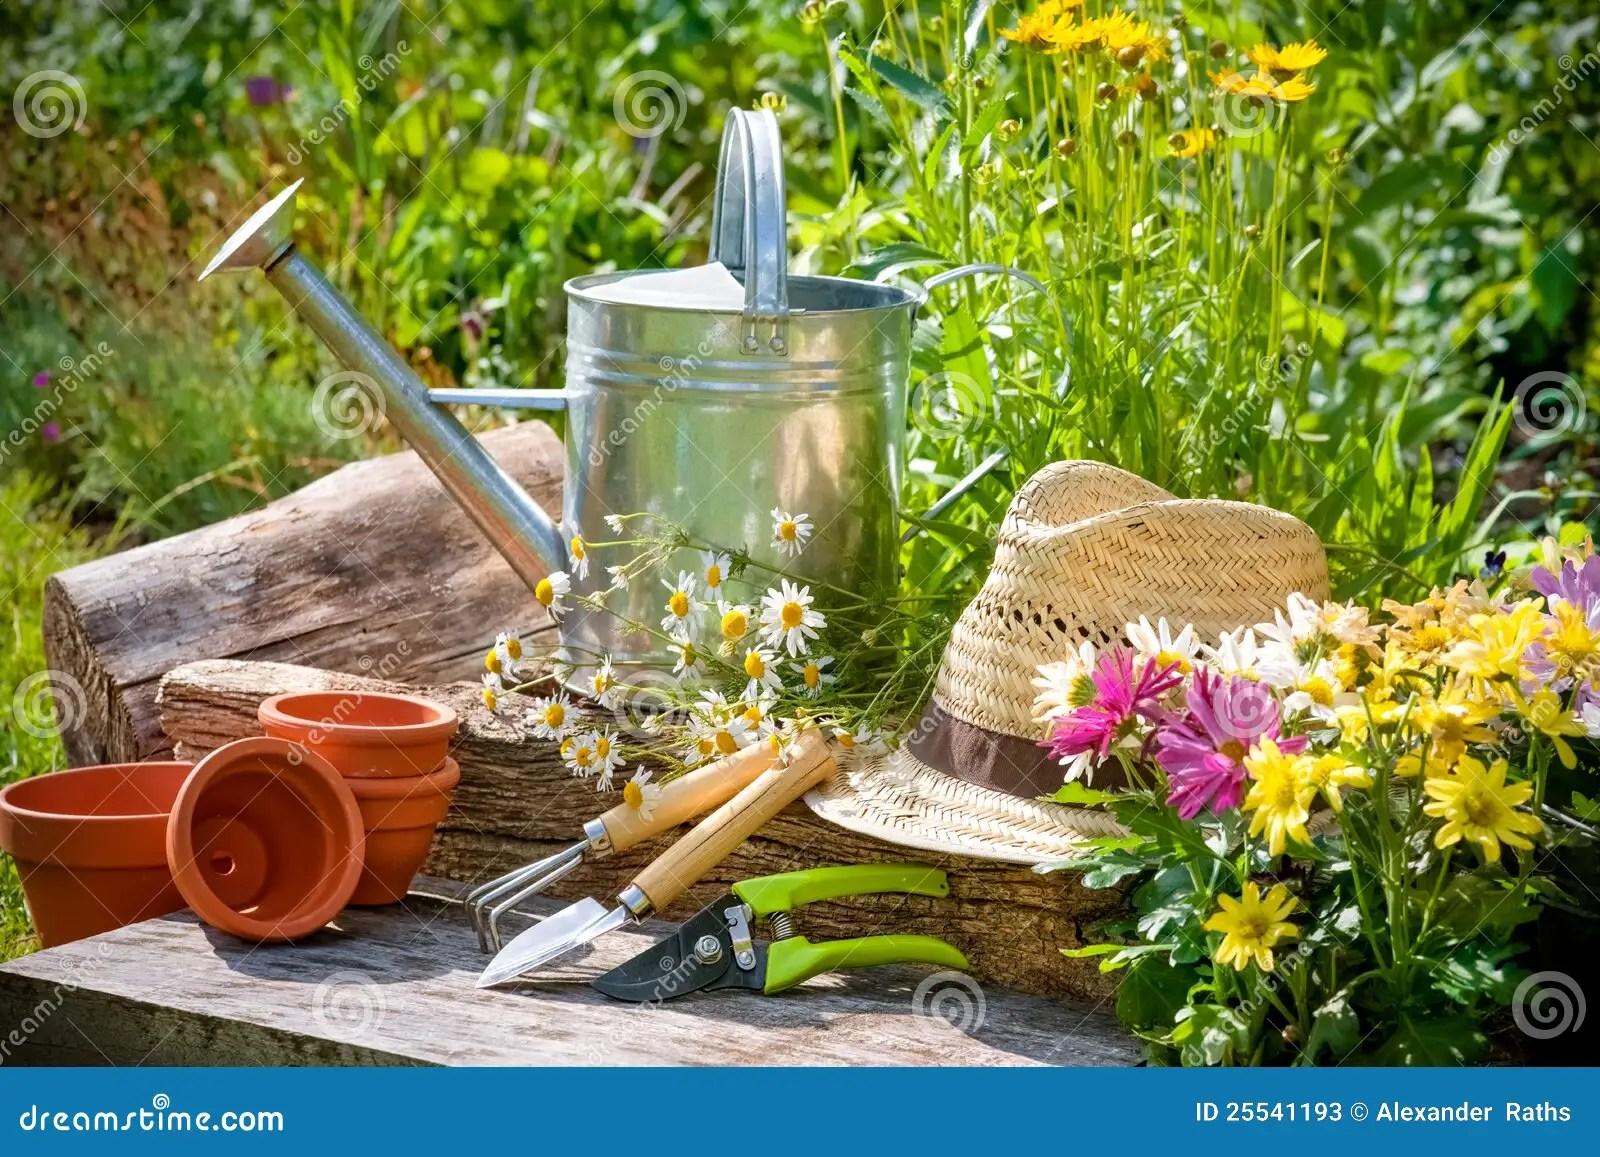 Giardinaggio Lavoro